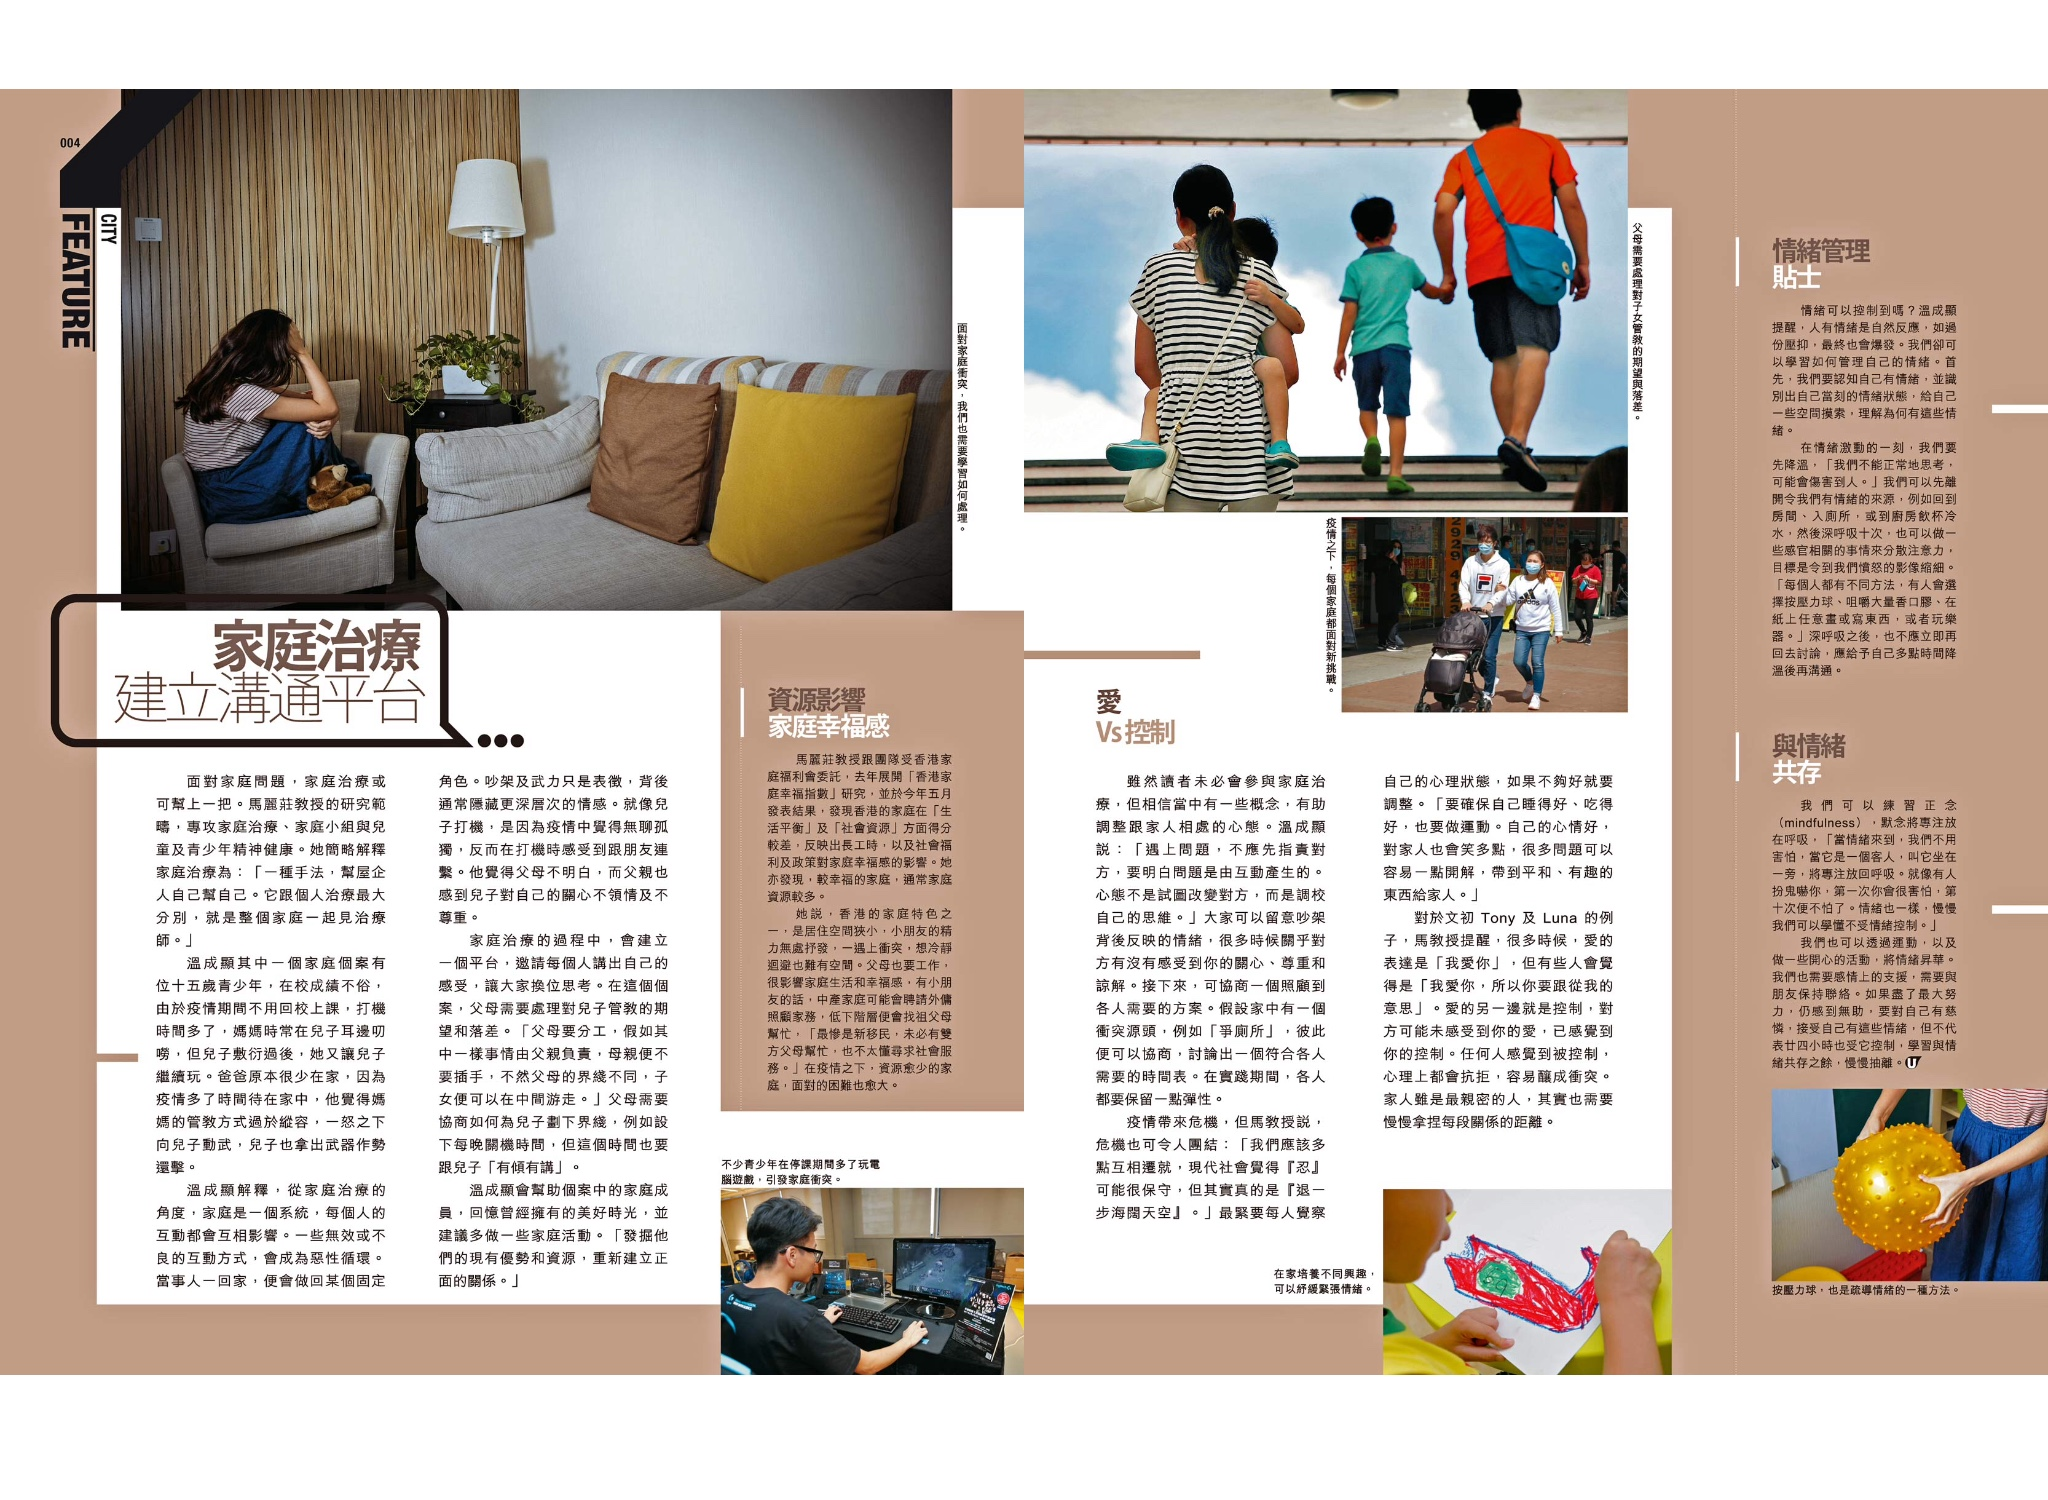 Page 2 interviewed by U Mag